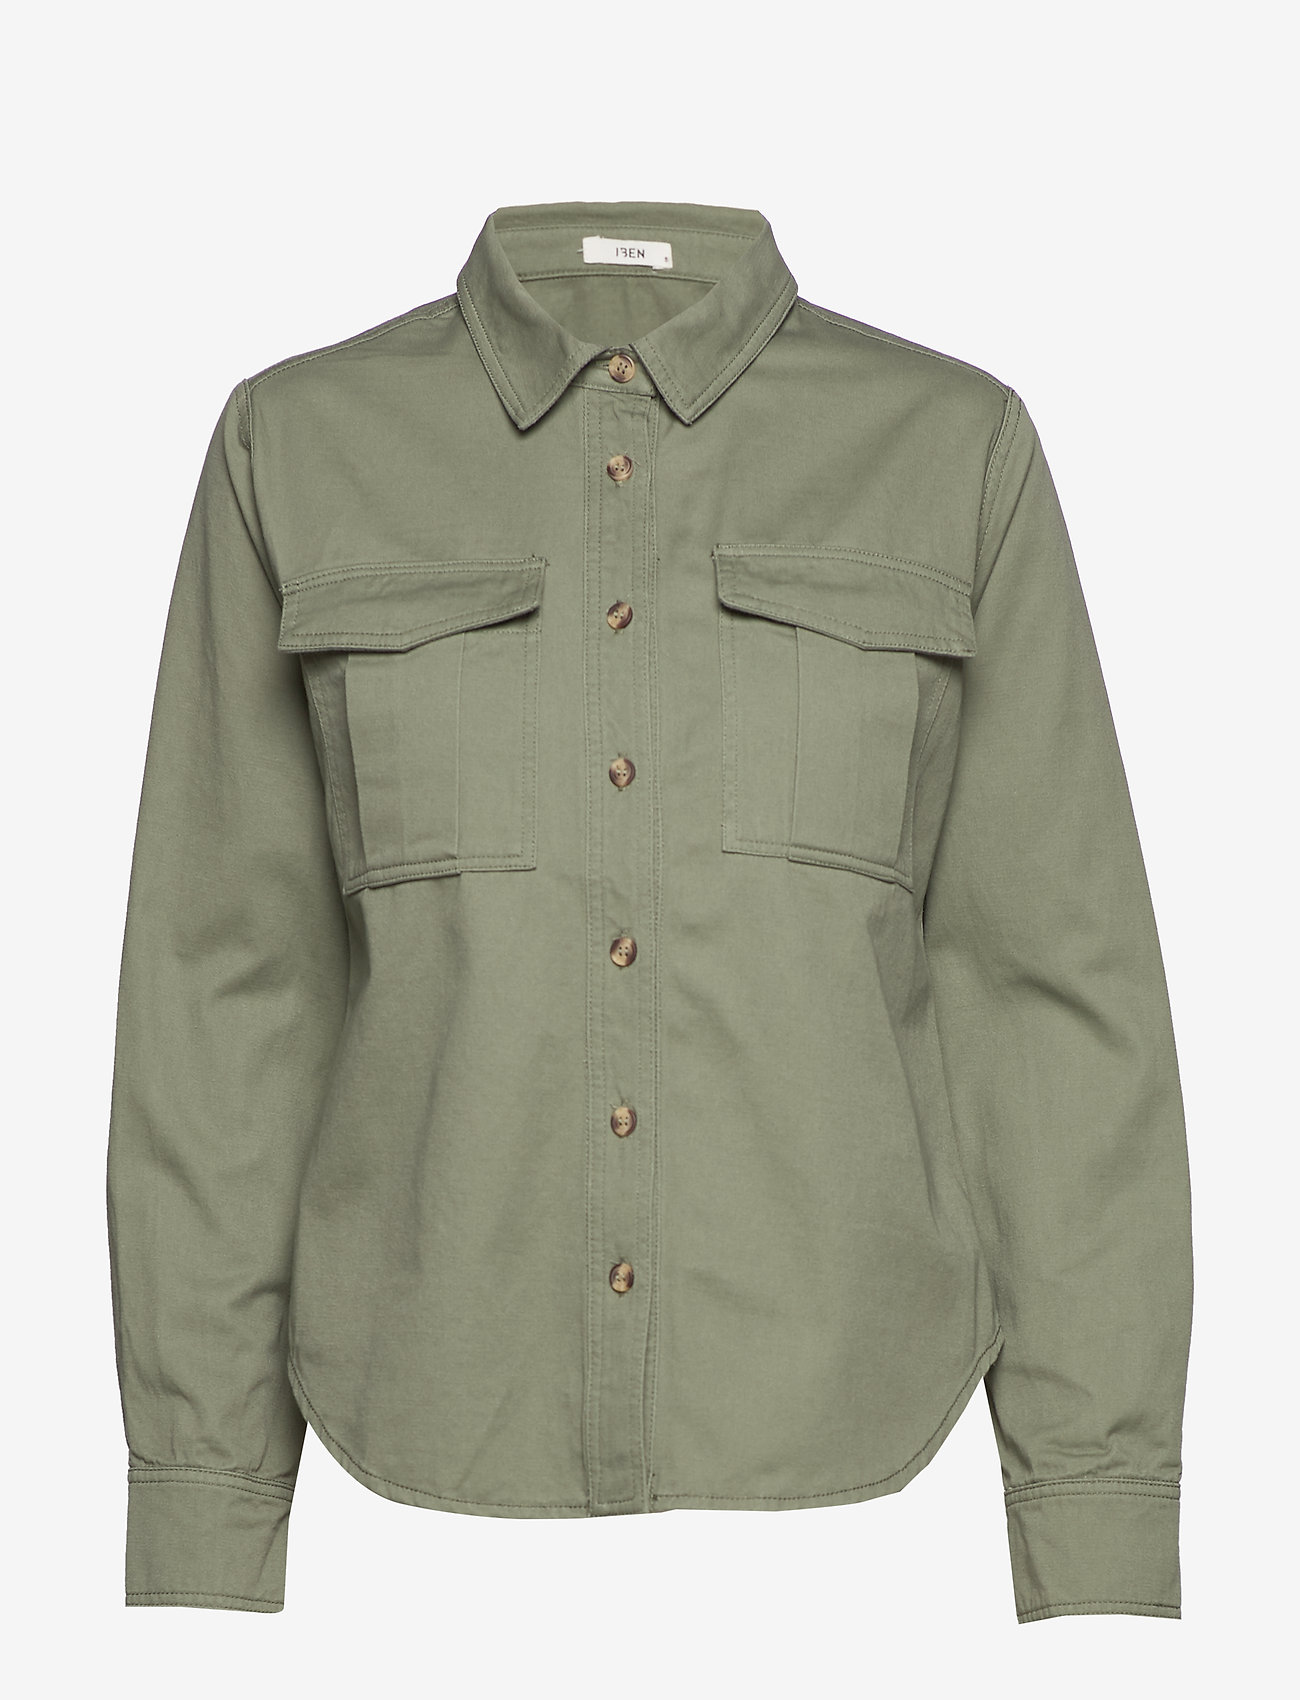 IBEN - Asher Shirt STG - pitkähihaiset paidat - ash green